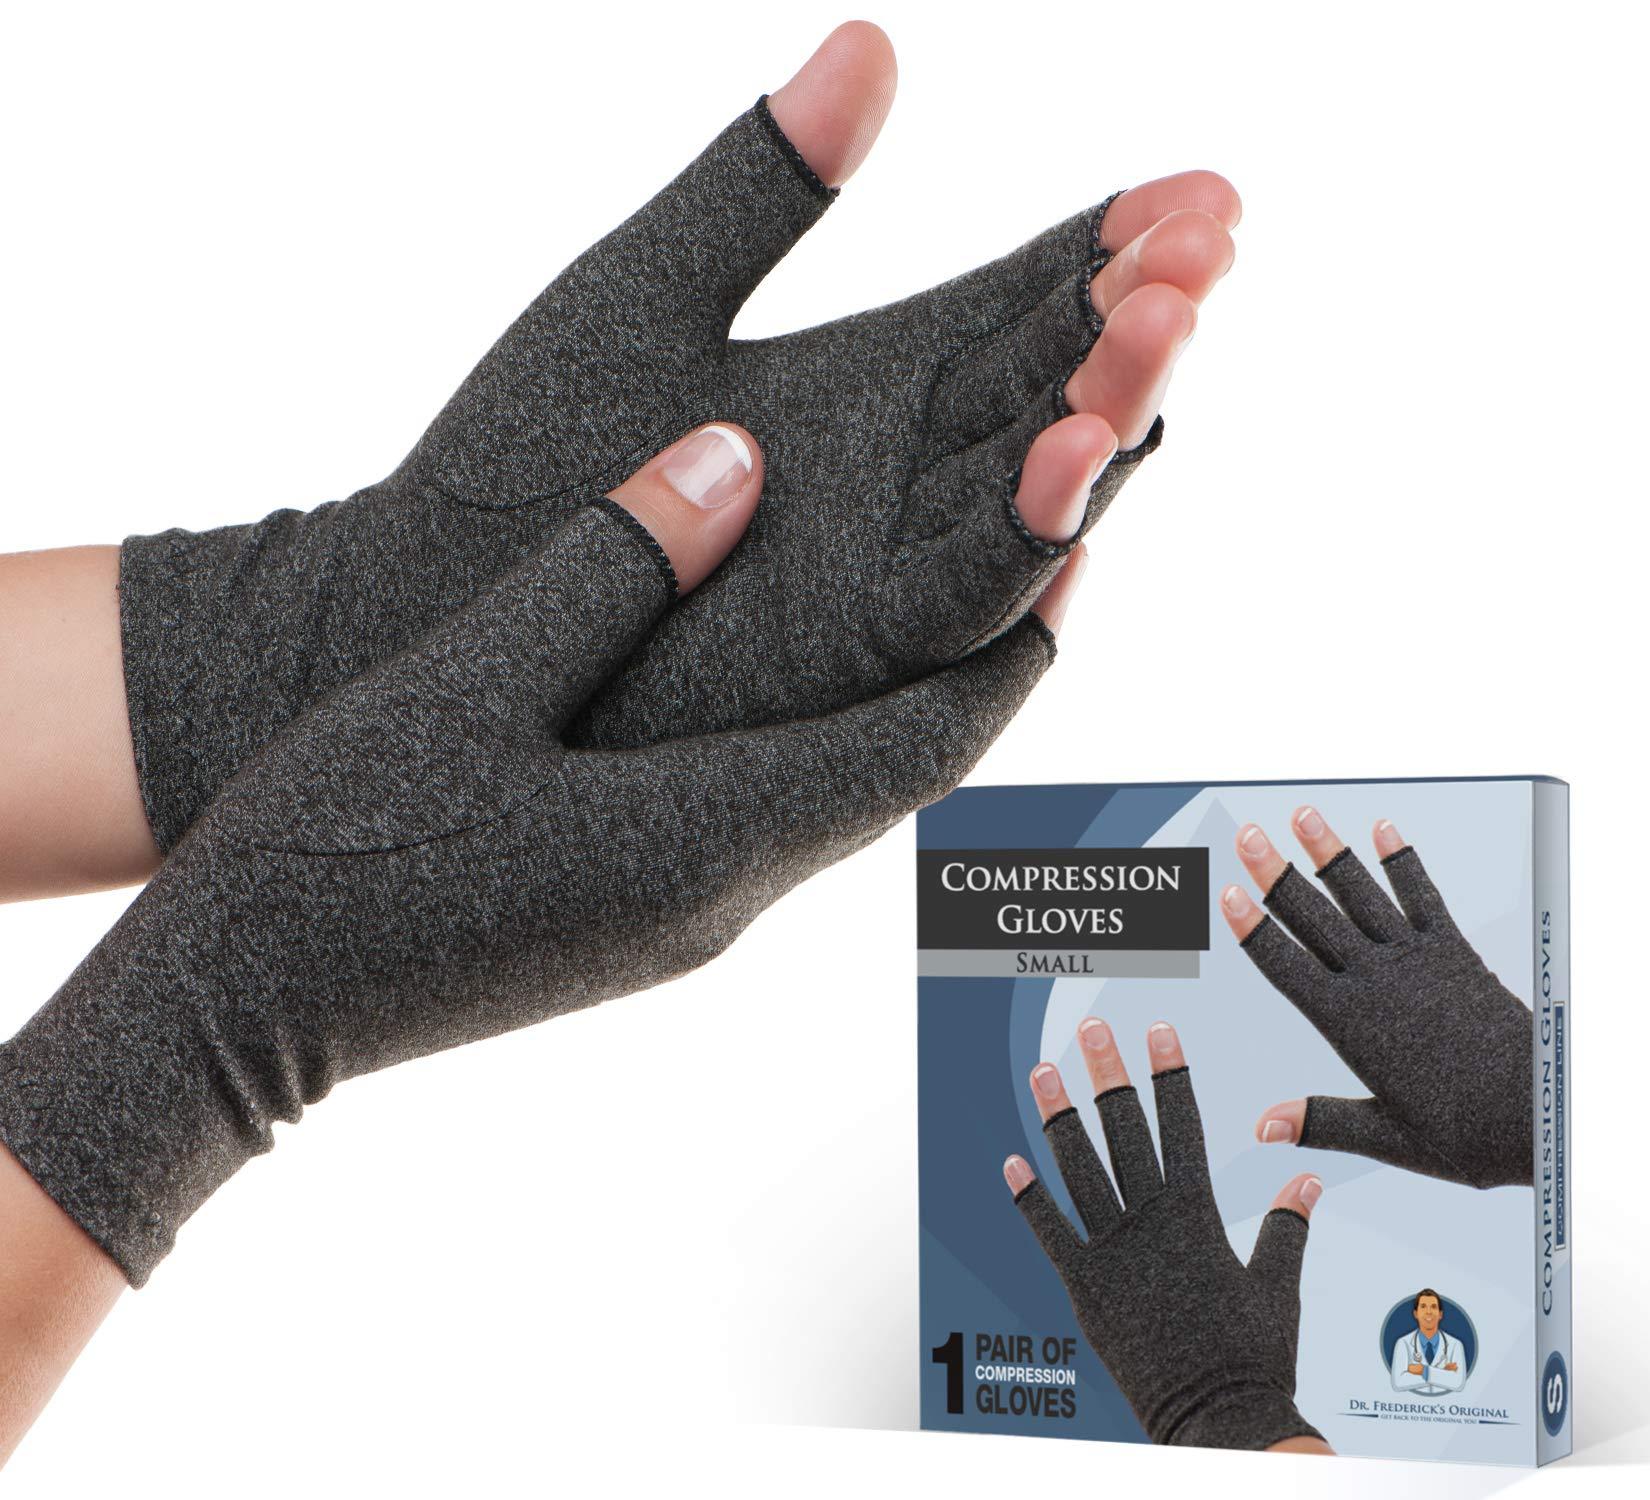 Dr. Frederick's Original Arthritis Gloves for Women & Men - Compression for Arthritis Pain Relief - Small